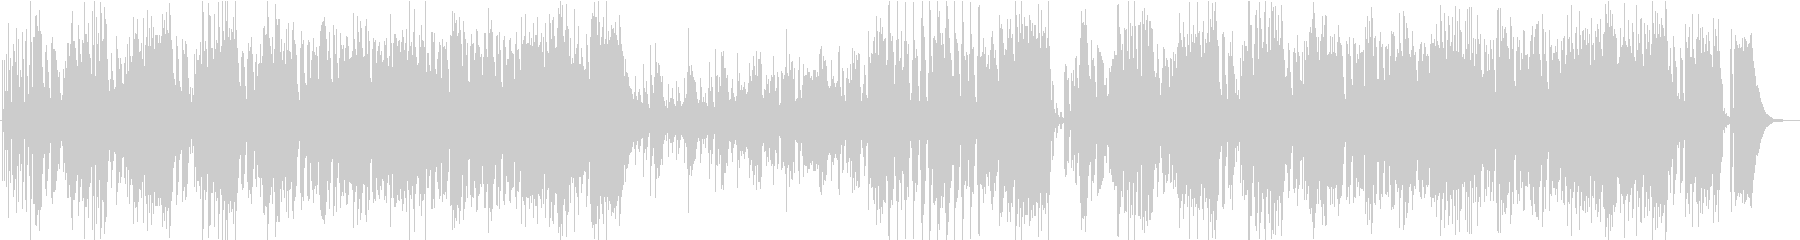 【CM】クール、ノリノリなJazzの未再生の波形